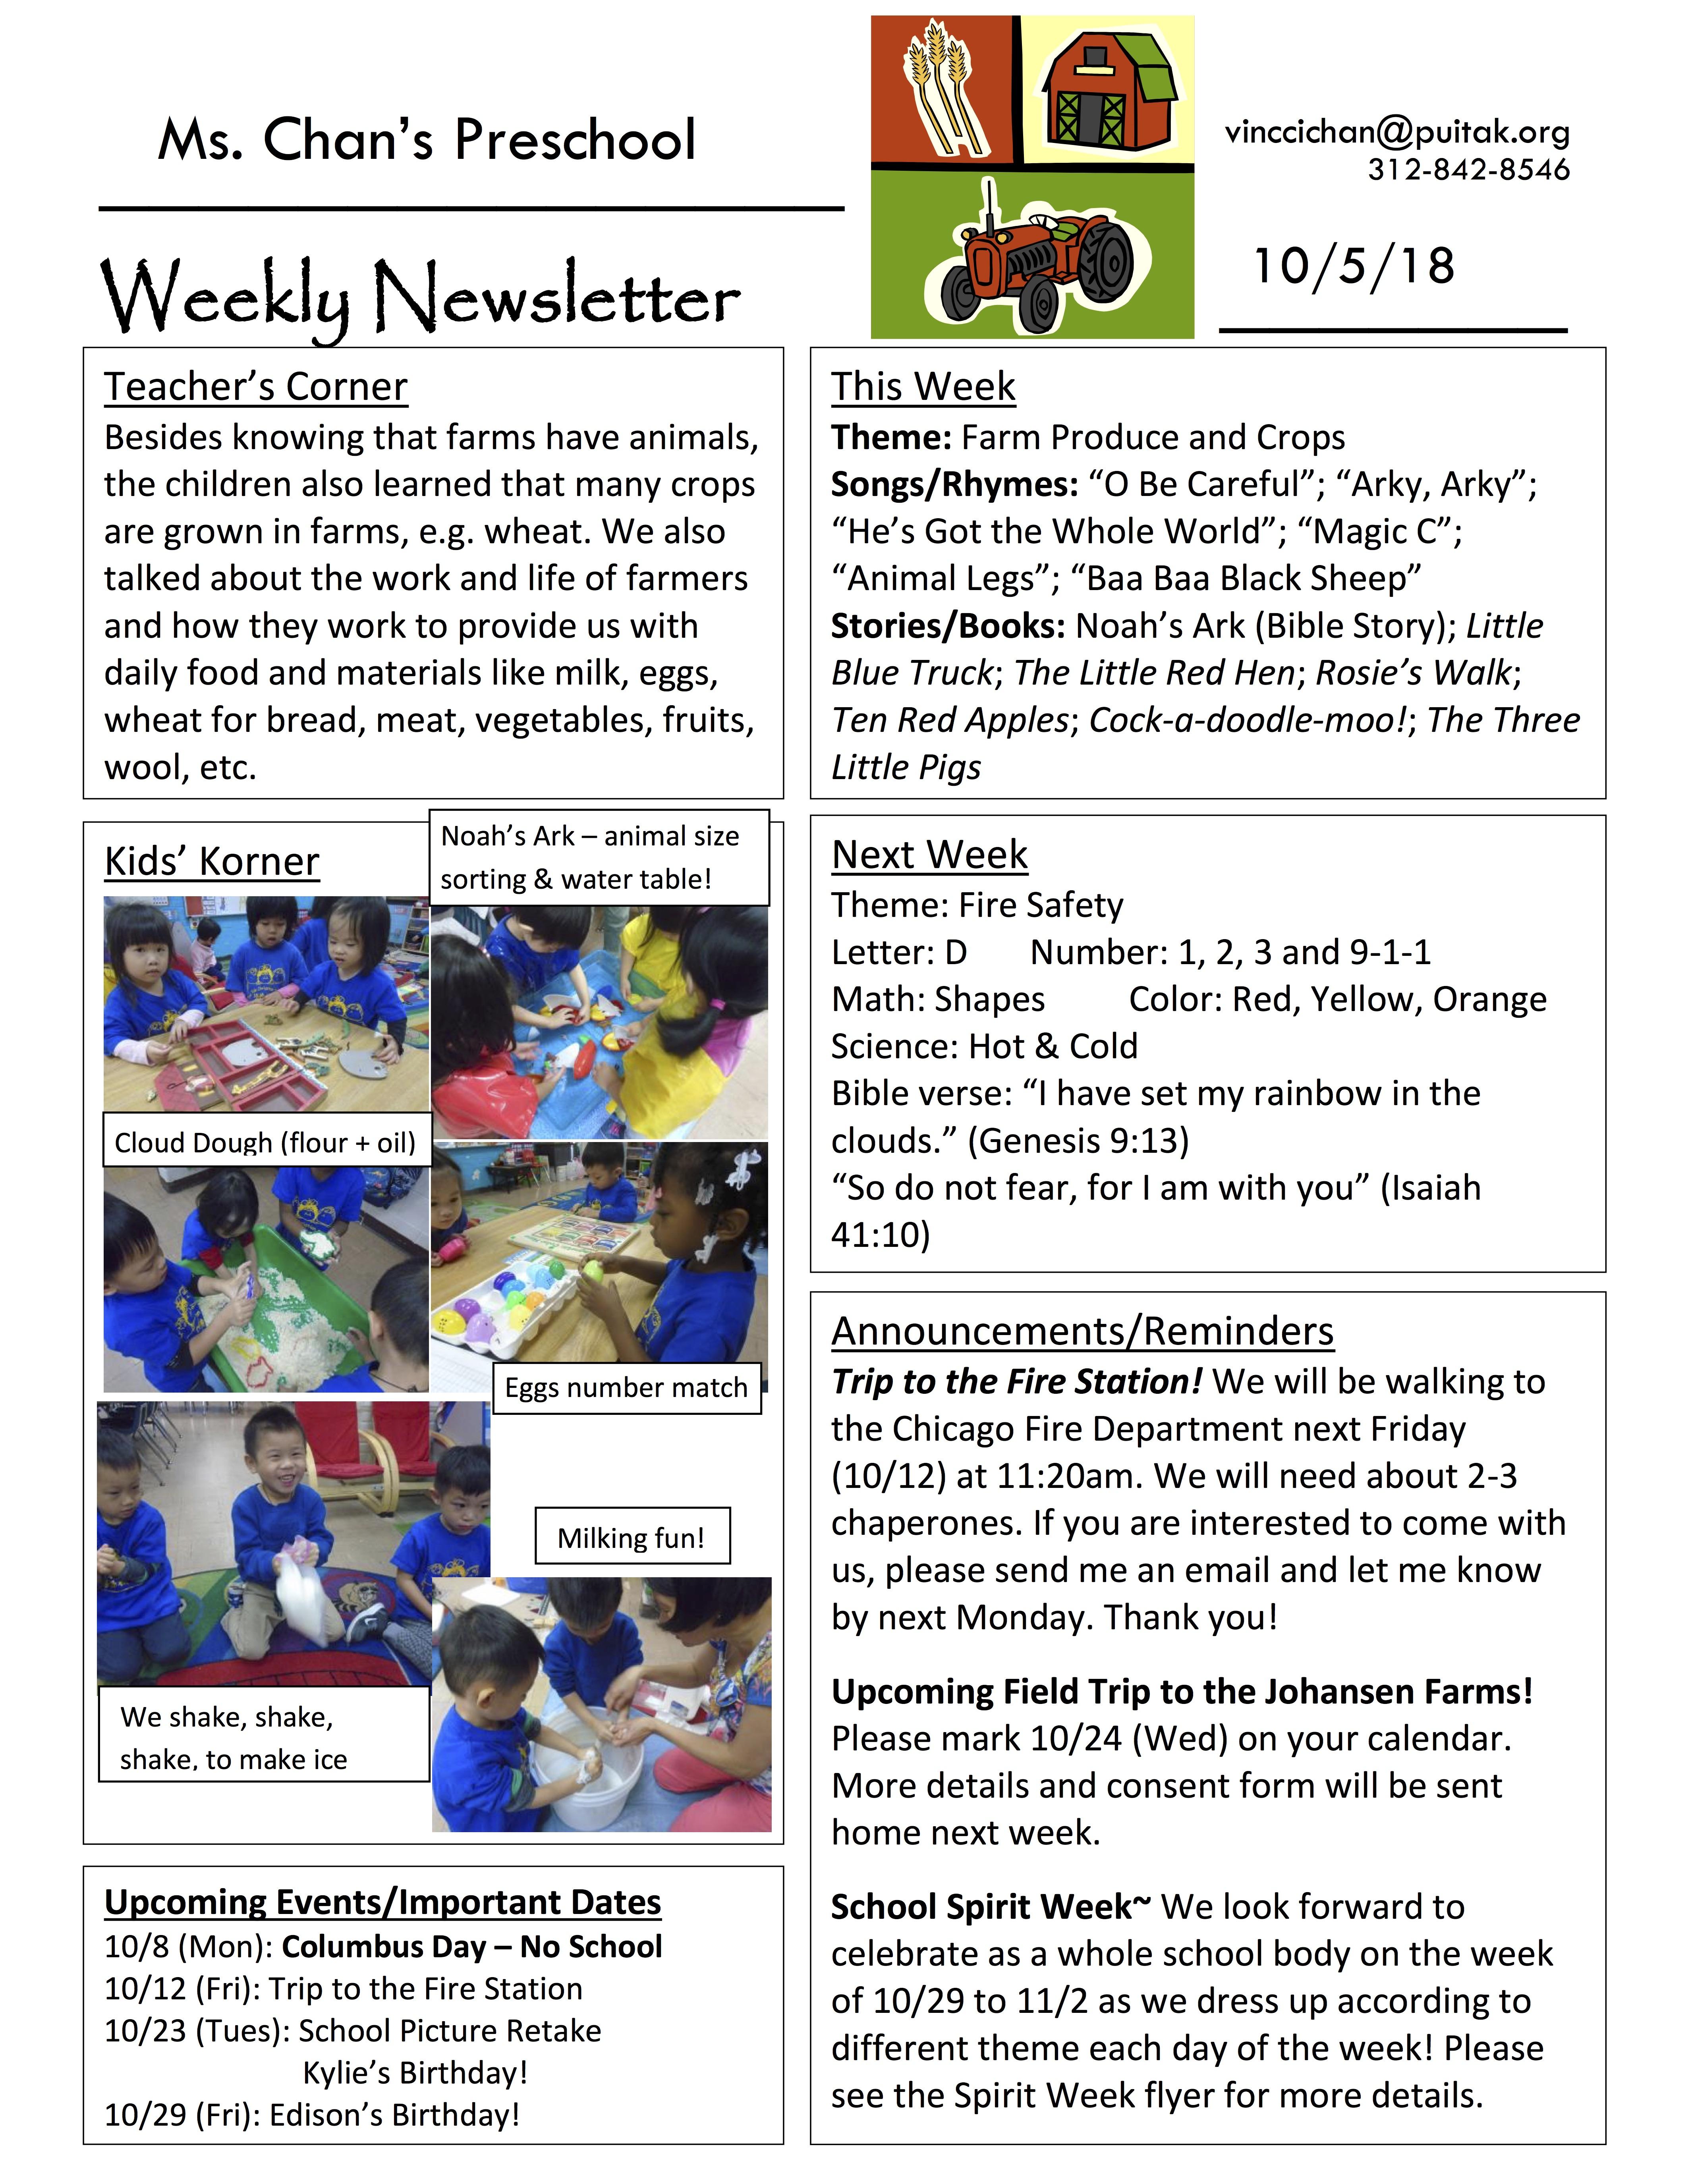 VincciNewsletter2018October1stWeek